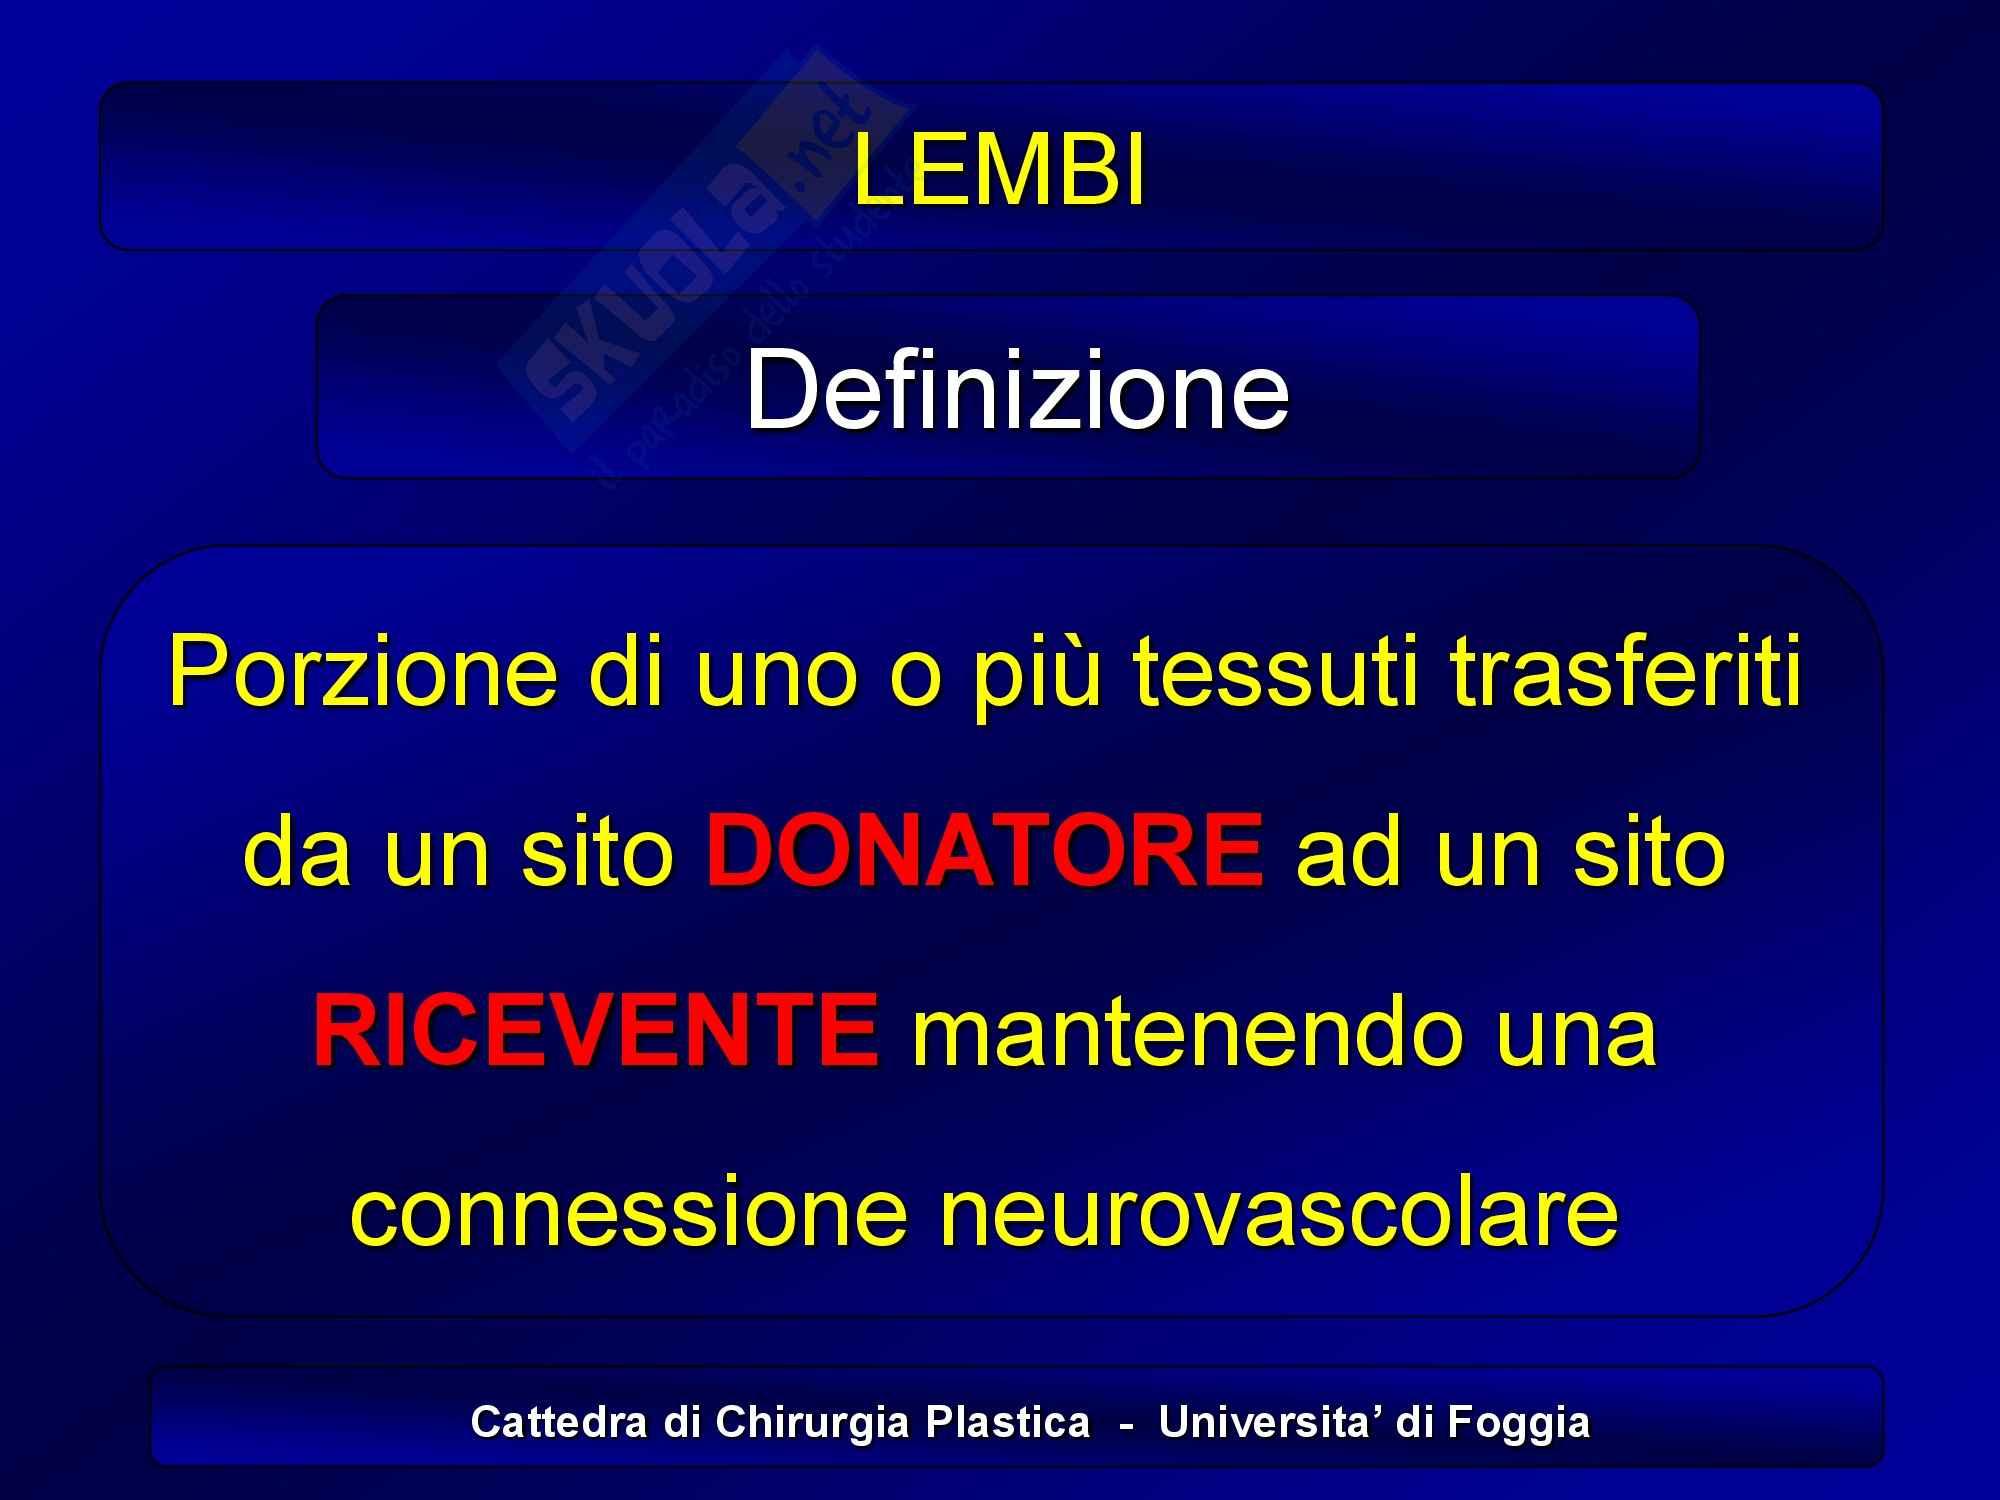 Chirurgia plastica - Lembi